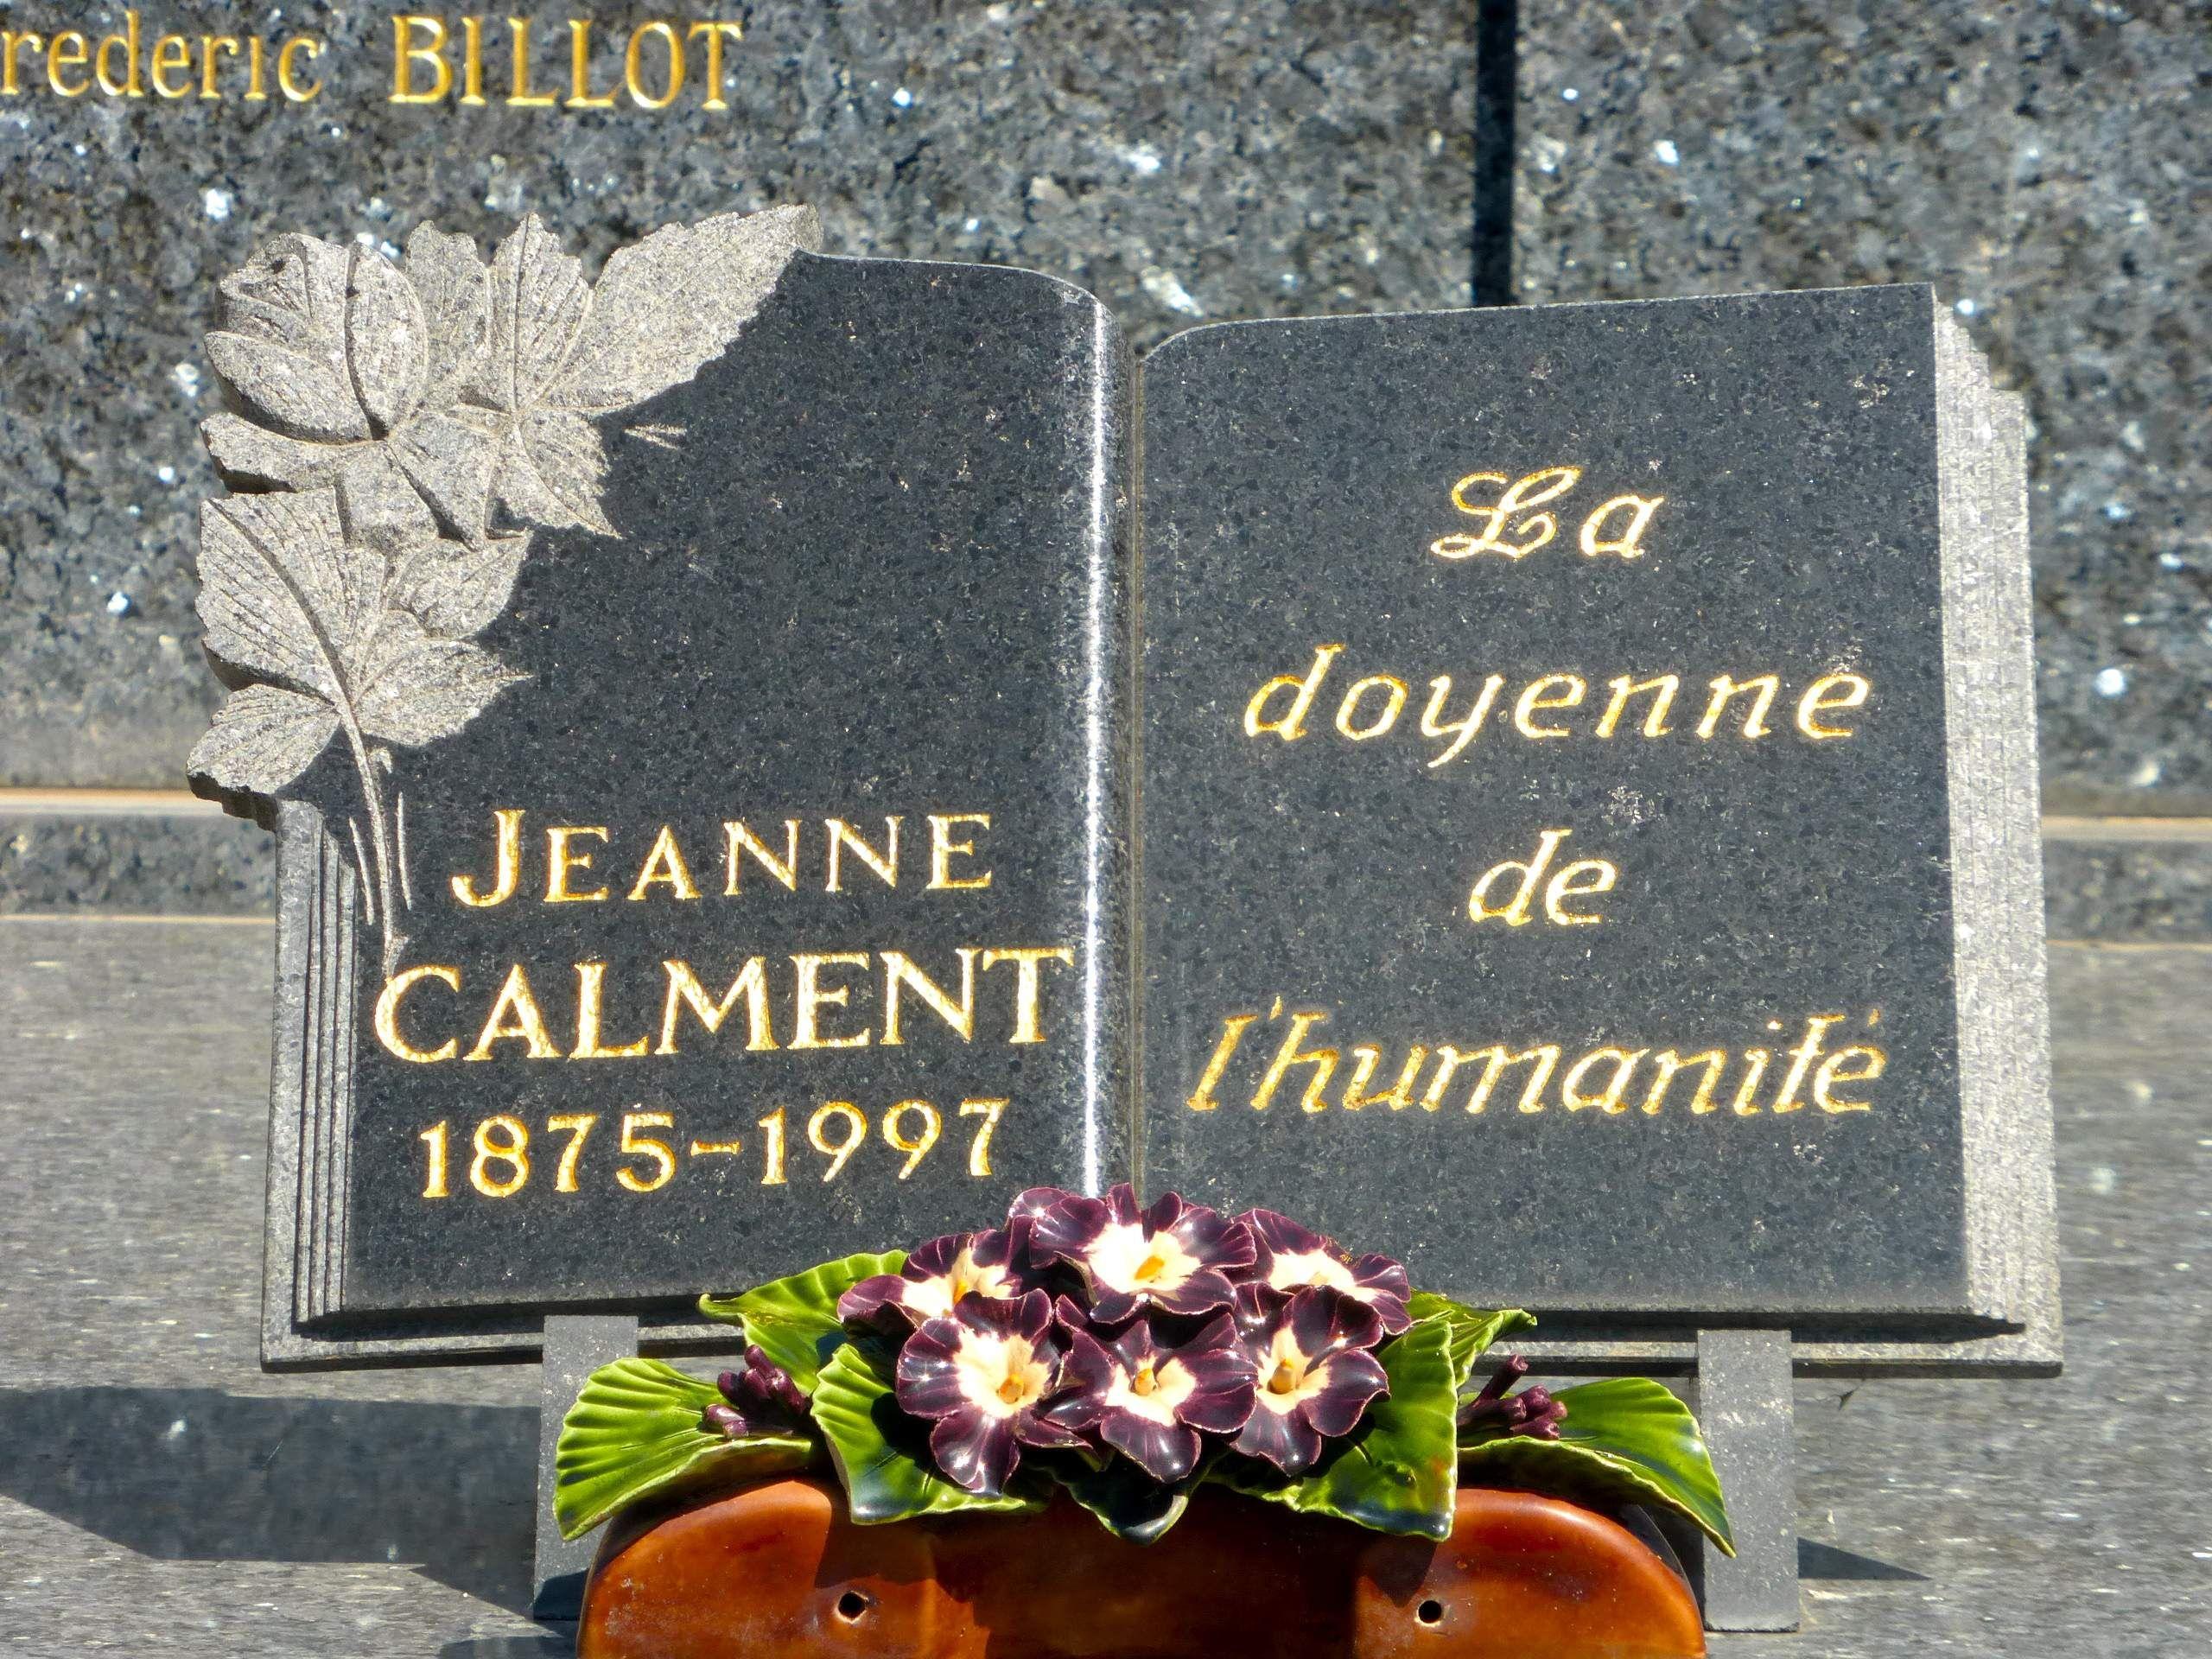 Jeanne Louise Calment (1875 - 1997)   Louis, Jeanne, Photo